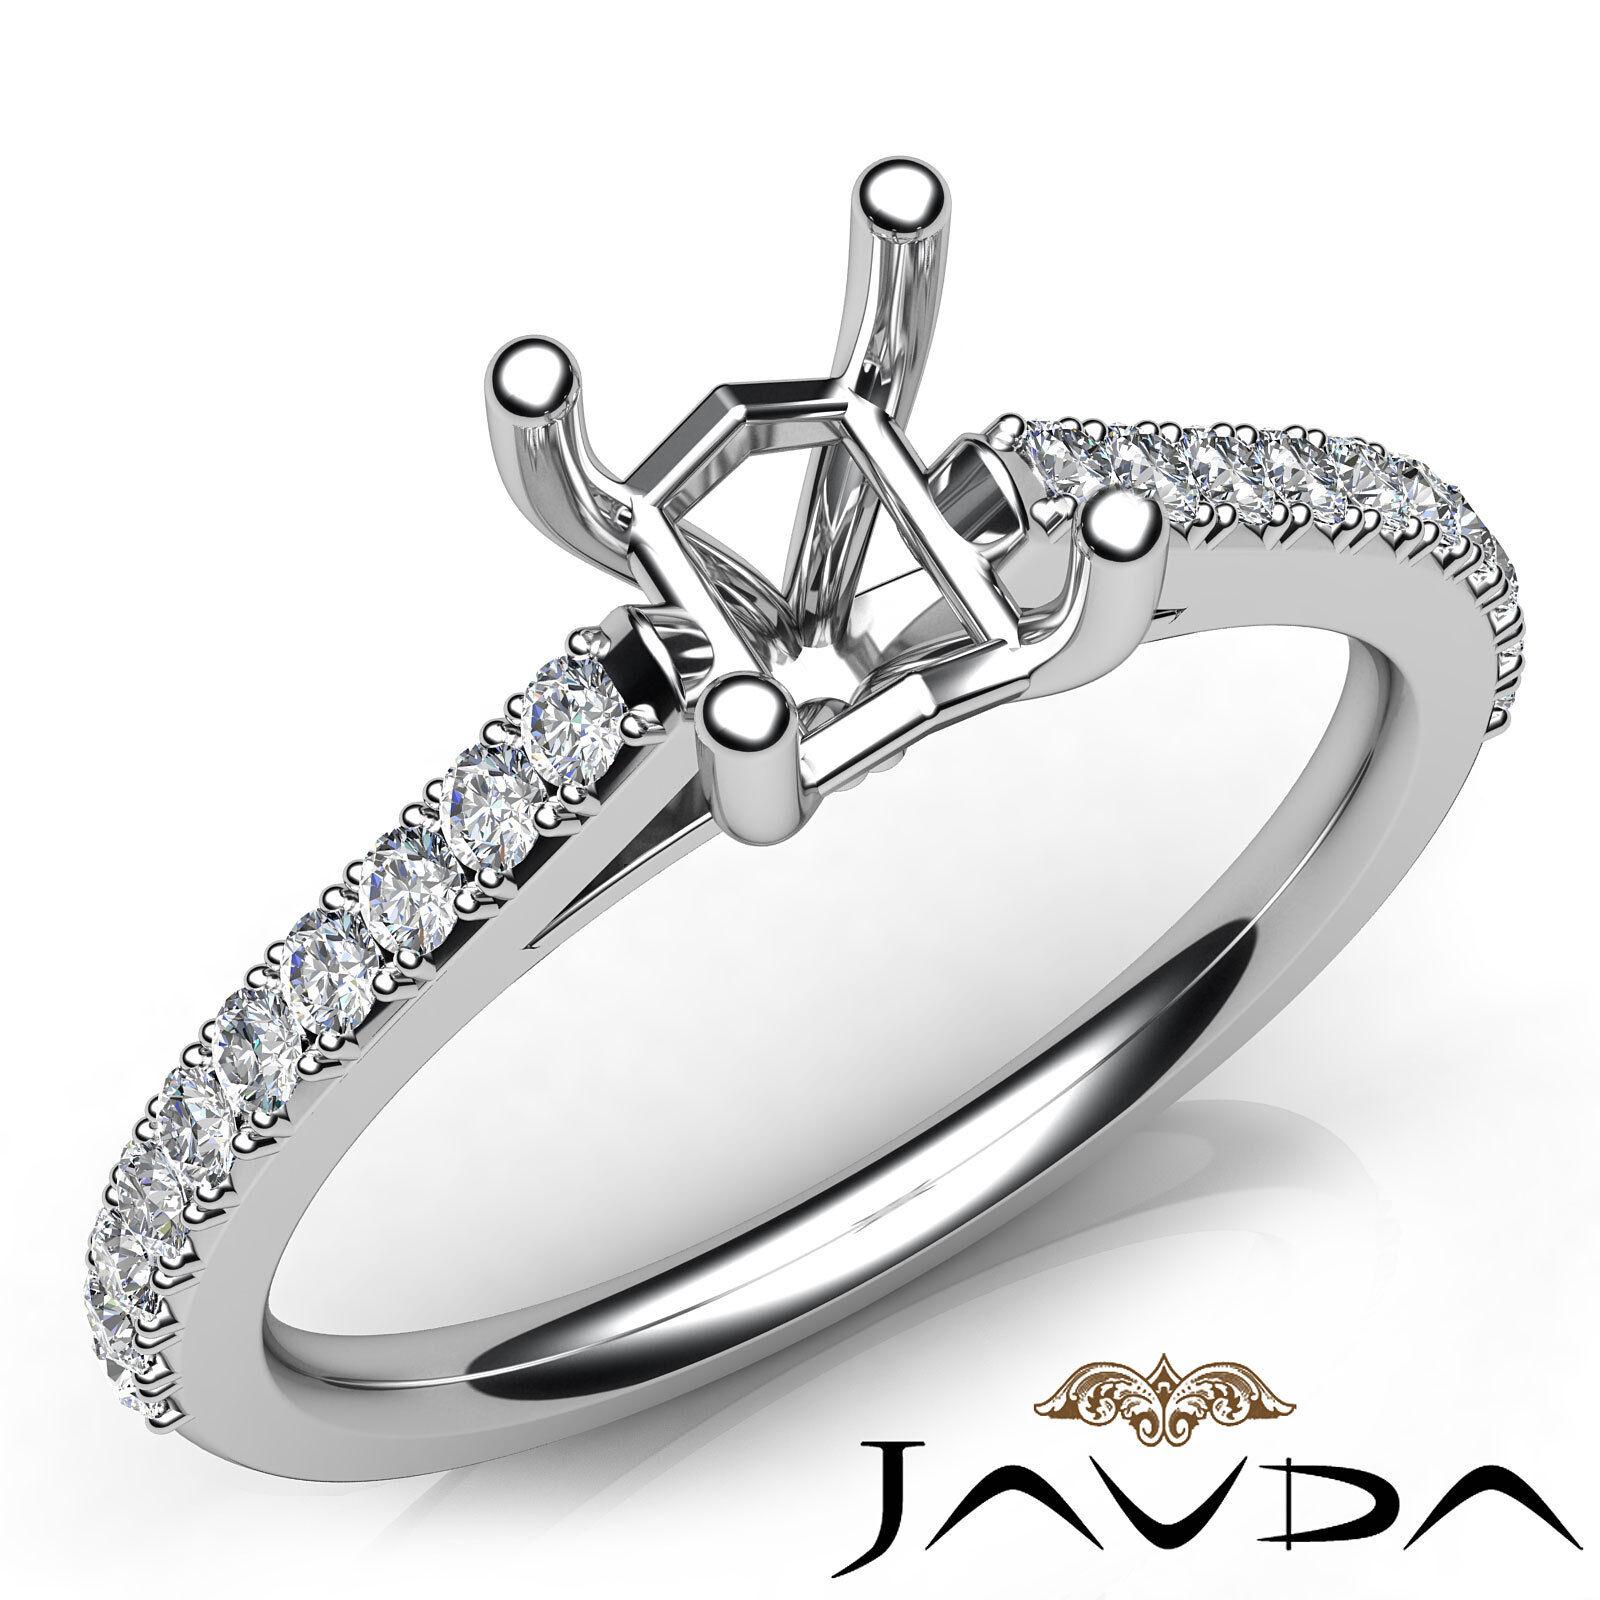 Prong Setting Asscher Diamond Engagement Semi Mount Ring 14k White gold 0.3Ct